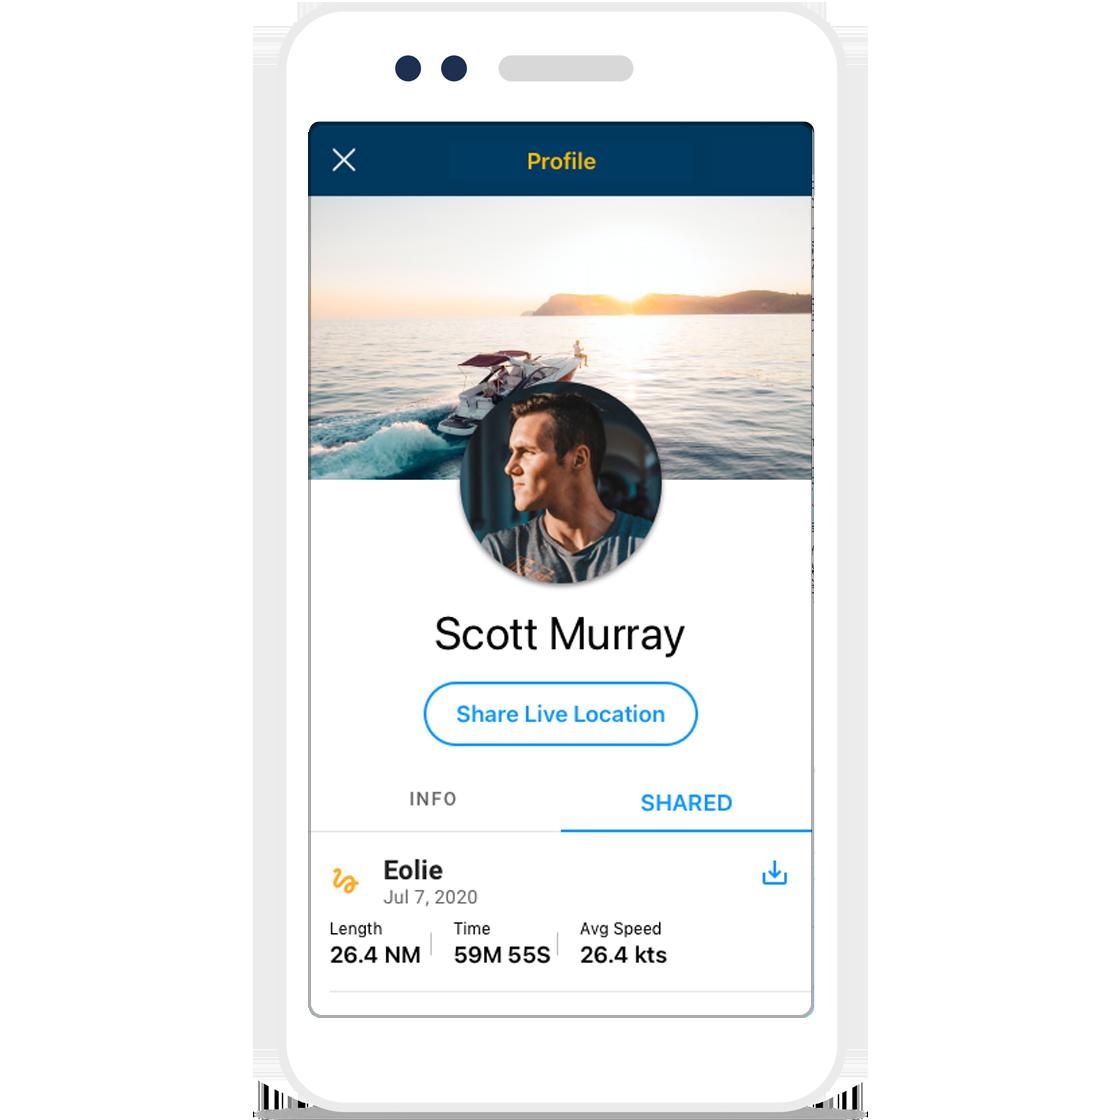 Navionics Boating App partage les itinéraires